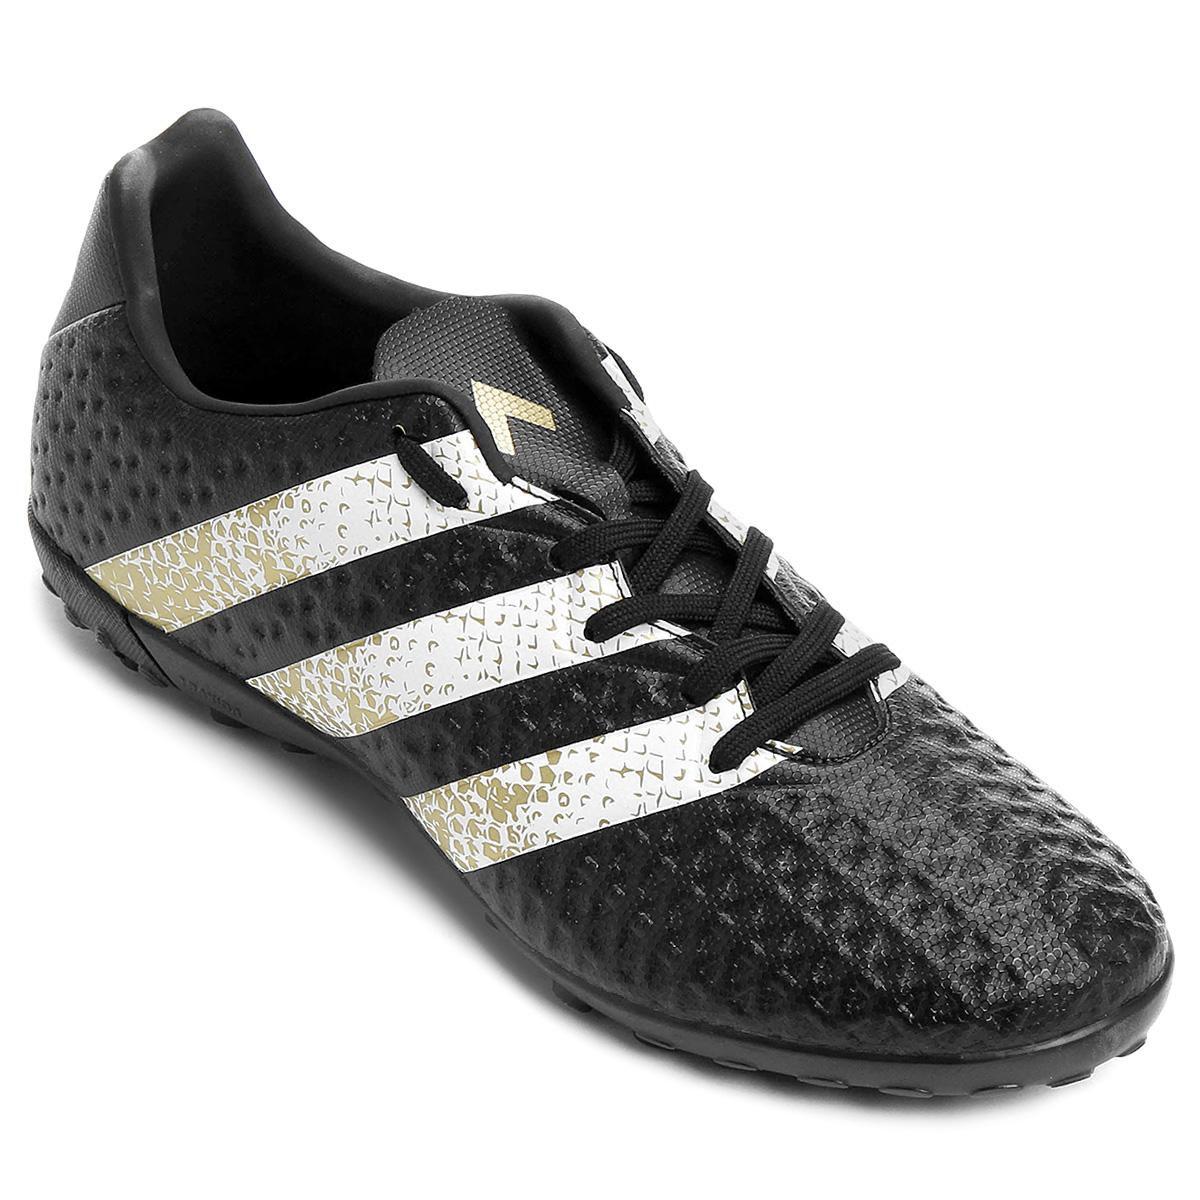 Chuteira Society Adidas Ace 16.4 - Preto